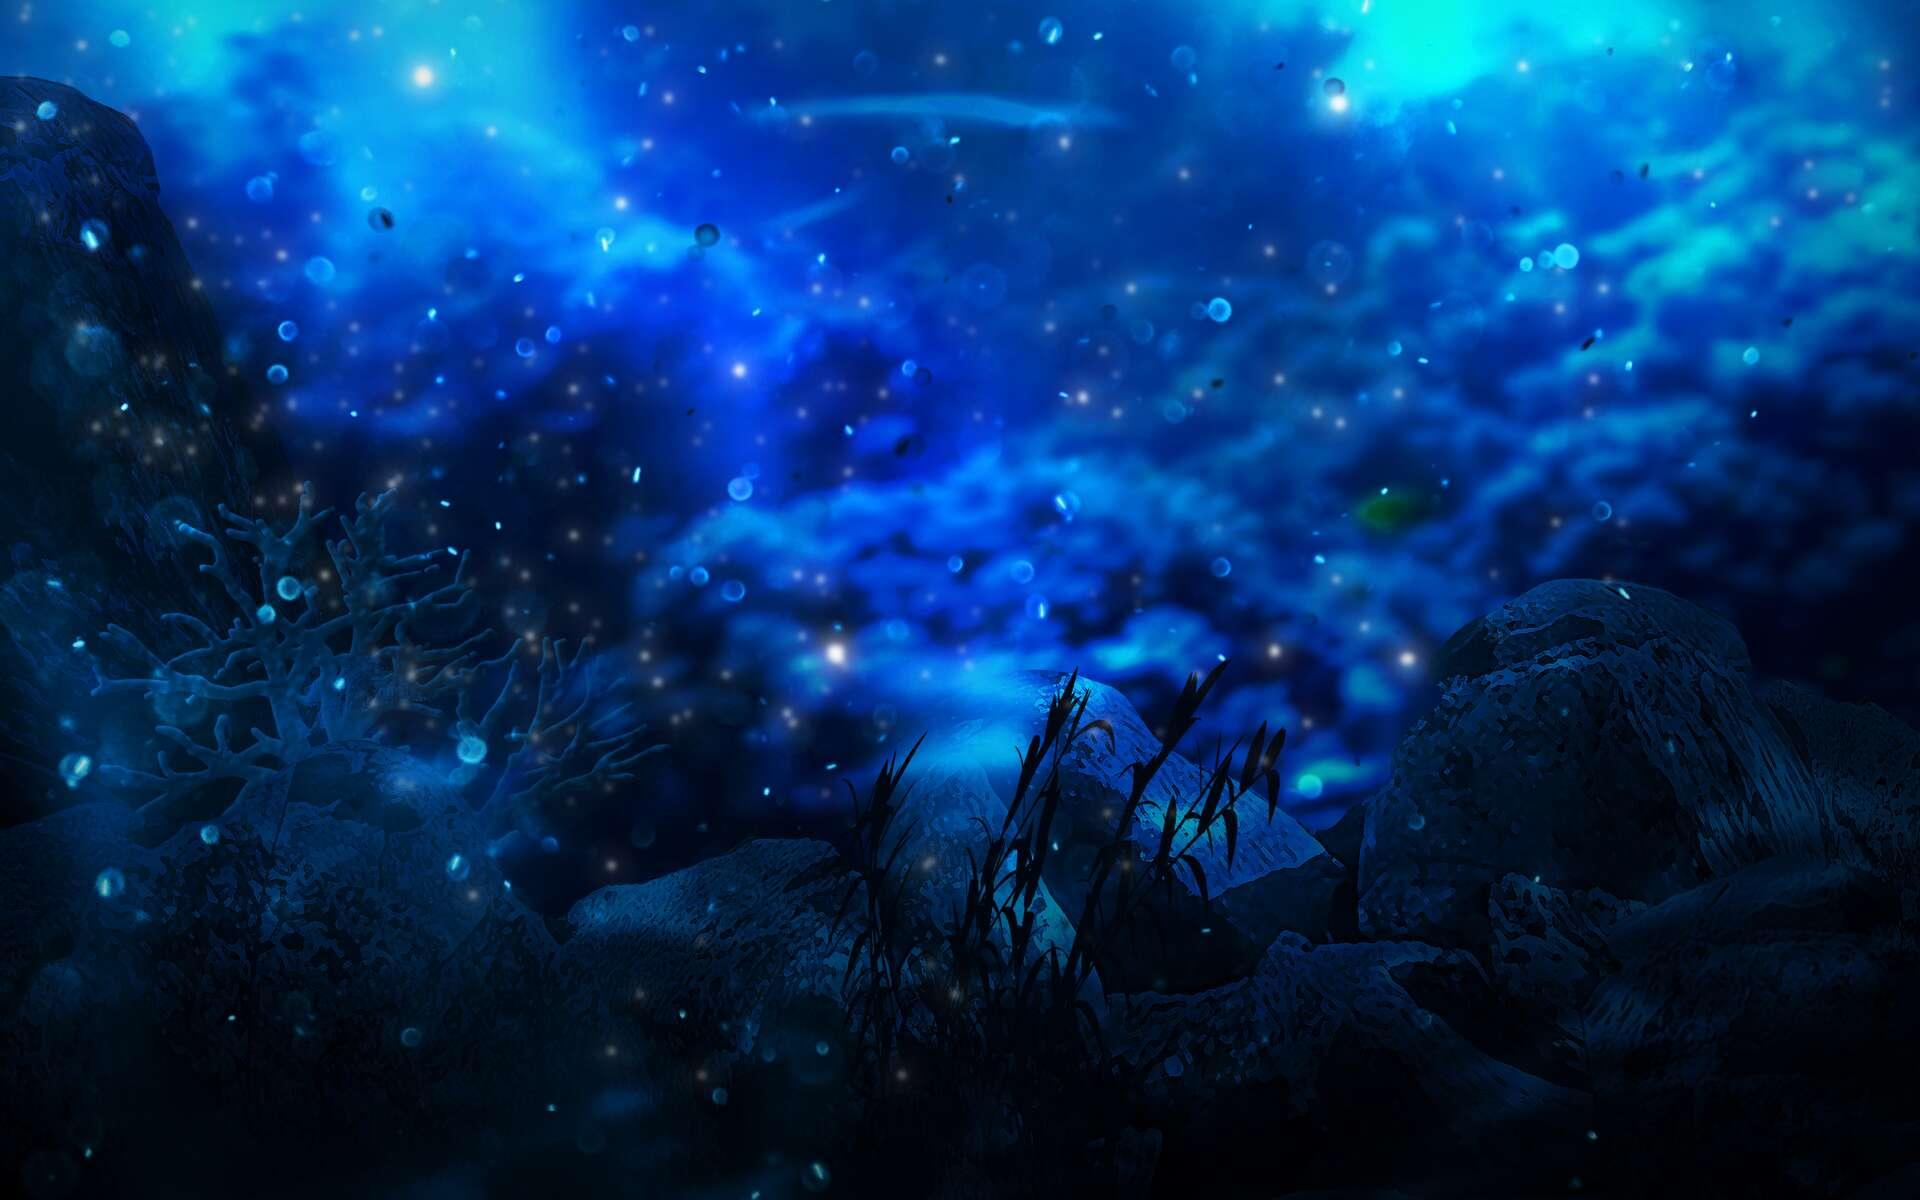 Illustration de fond marin. © MiaStendal, Adobe Stock